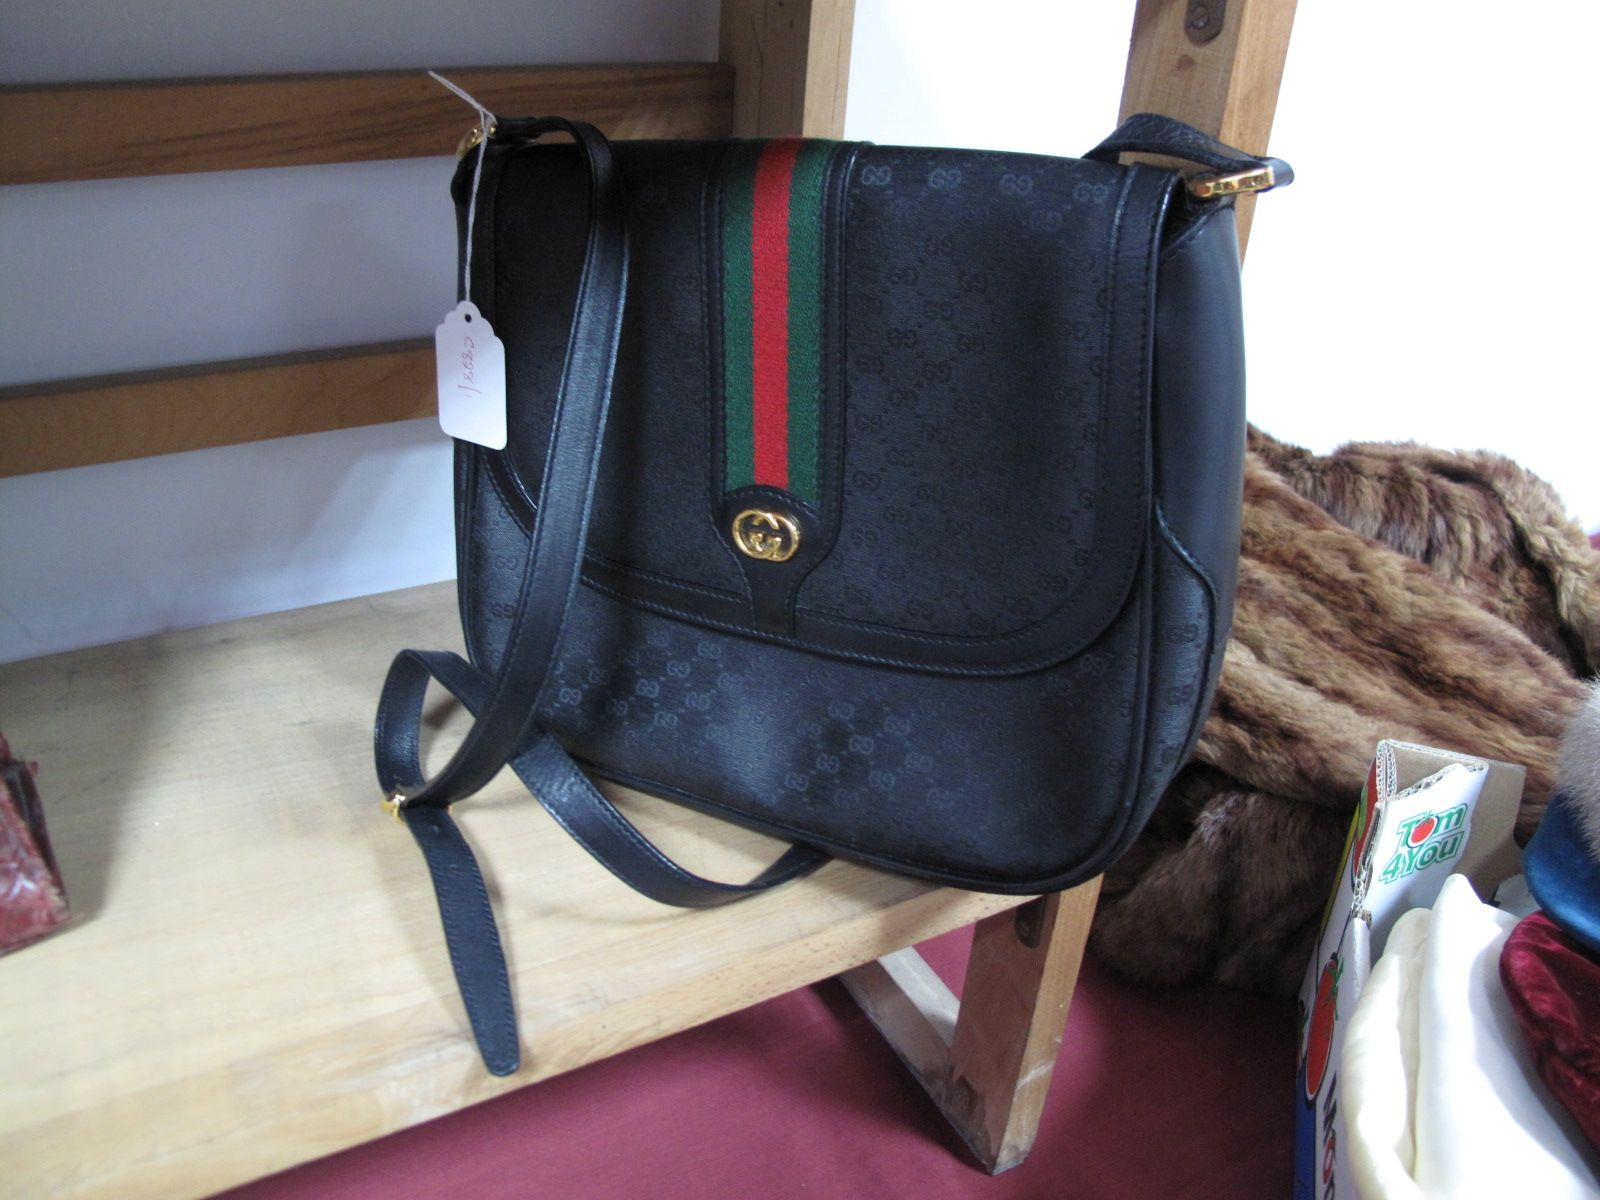 Lot 559 A Vintage Gucci Shoulder Bag In Black Leather And Monogrammed Canvas